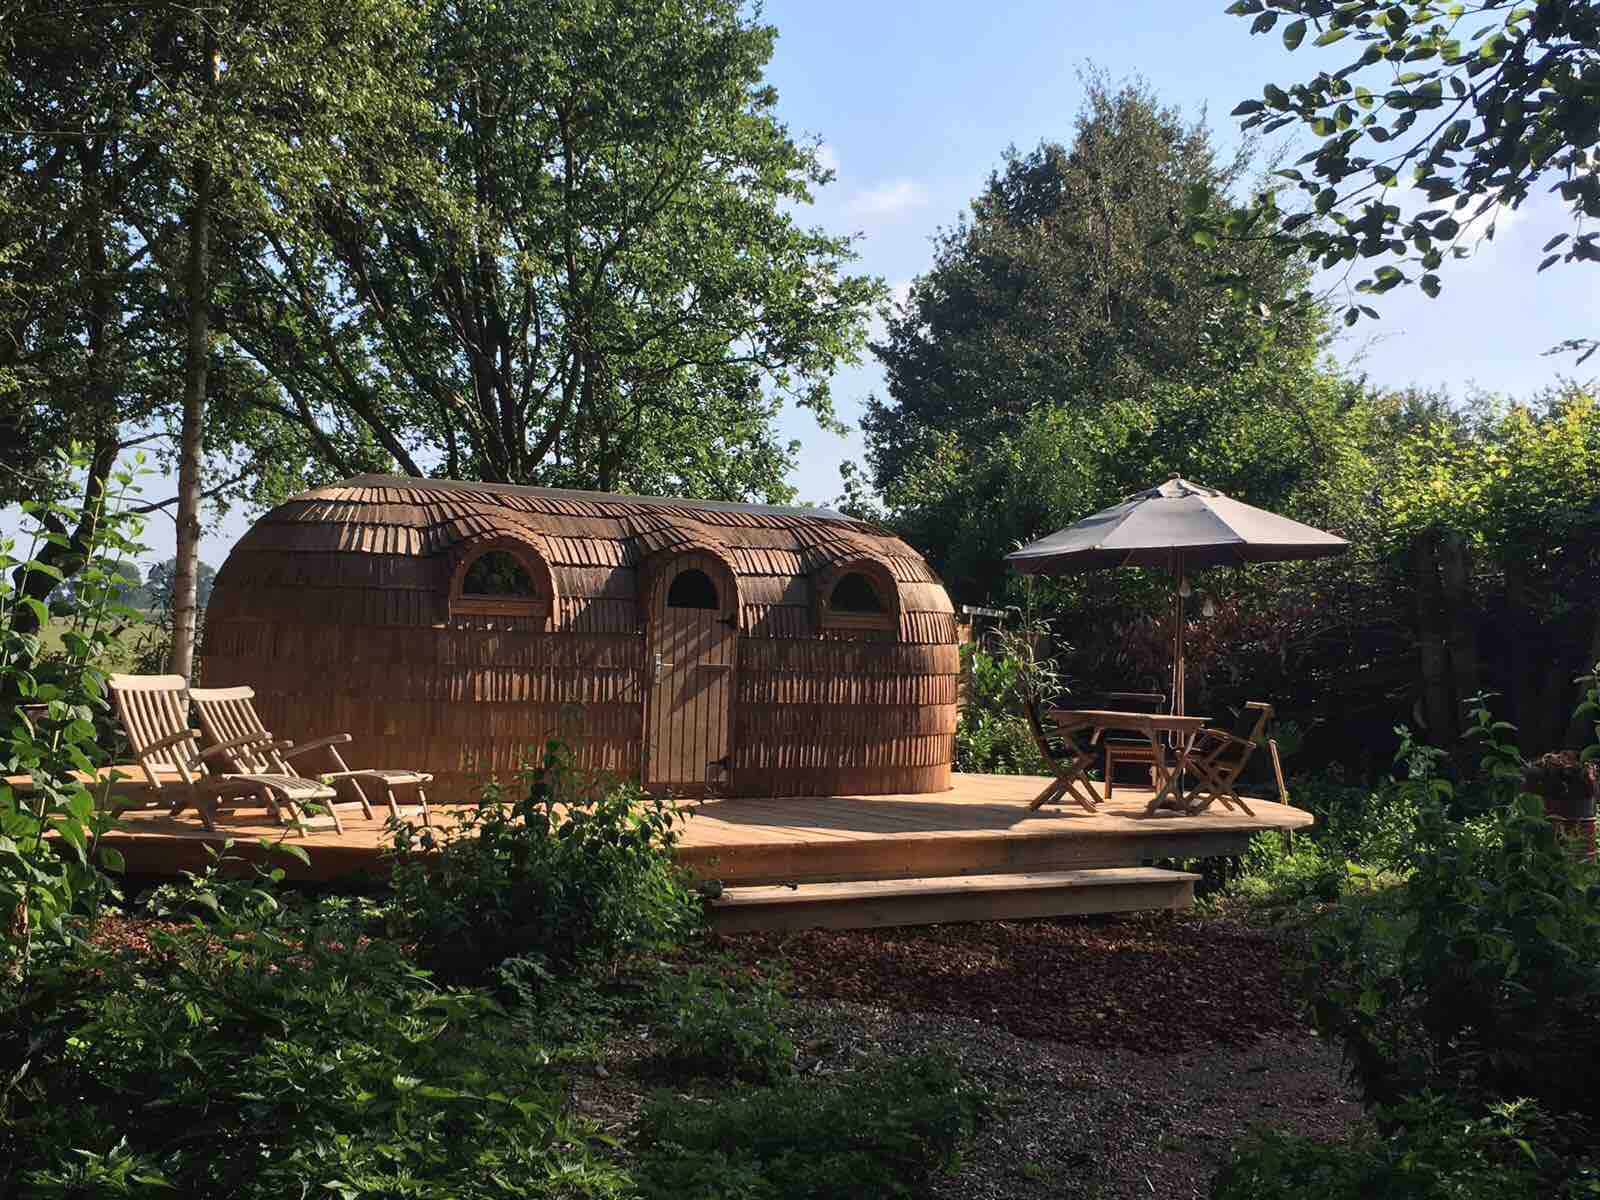 airbnb, finse tiny house, friesland, verborgen parels, vakantie, nederland